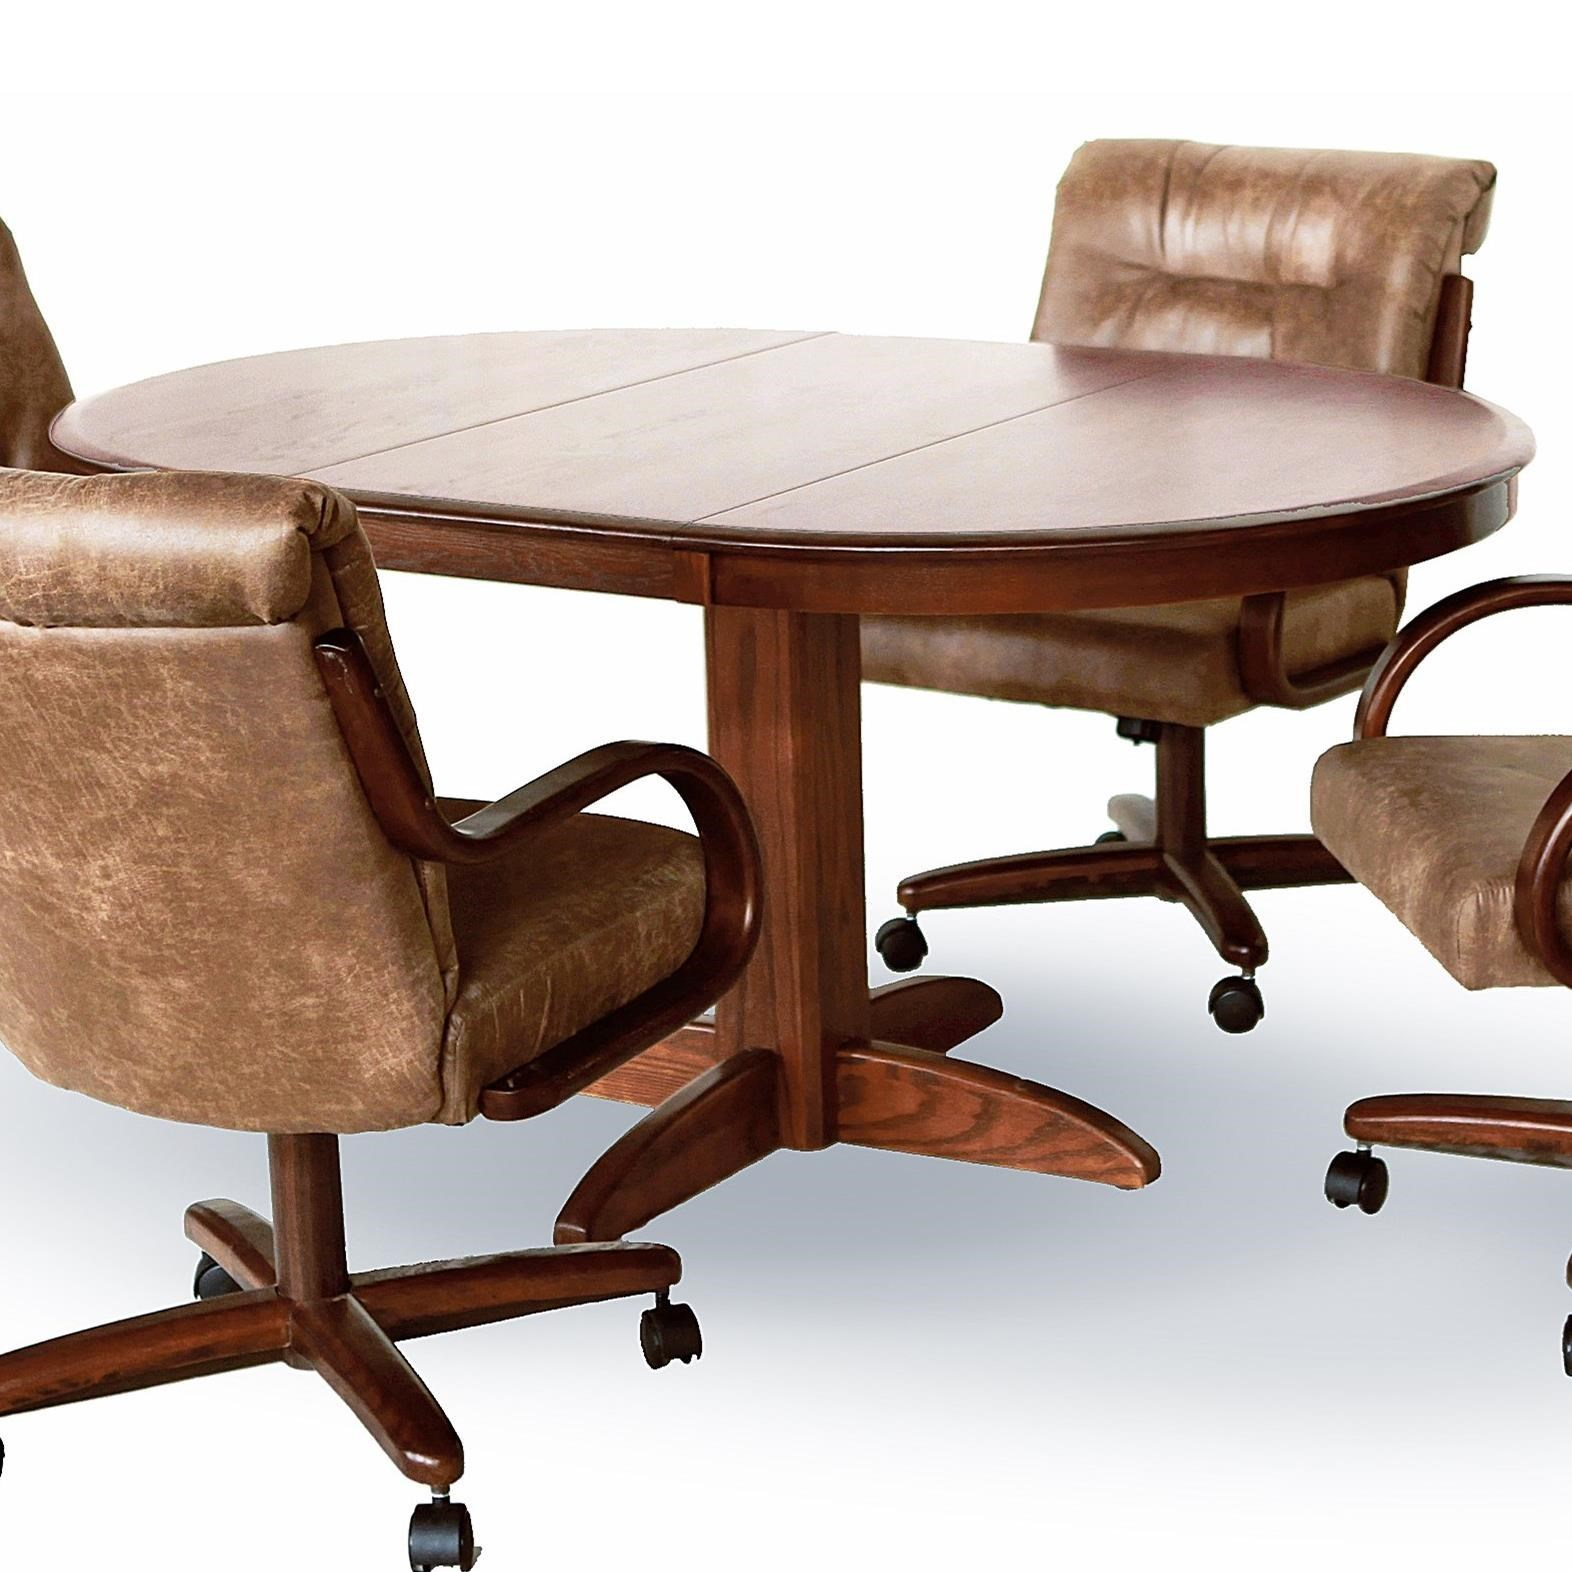 Chromcraft Custom DiningSolid Ash Oval Pedestal Table ...